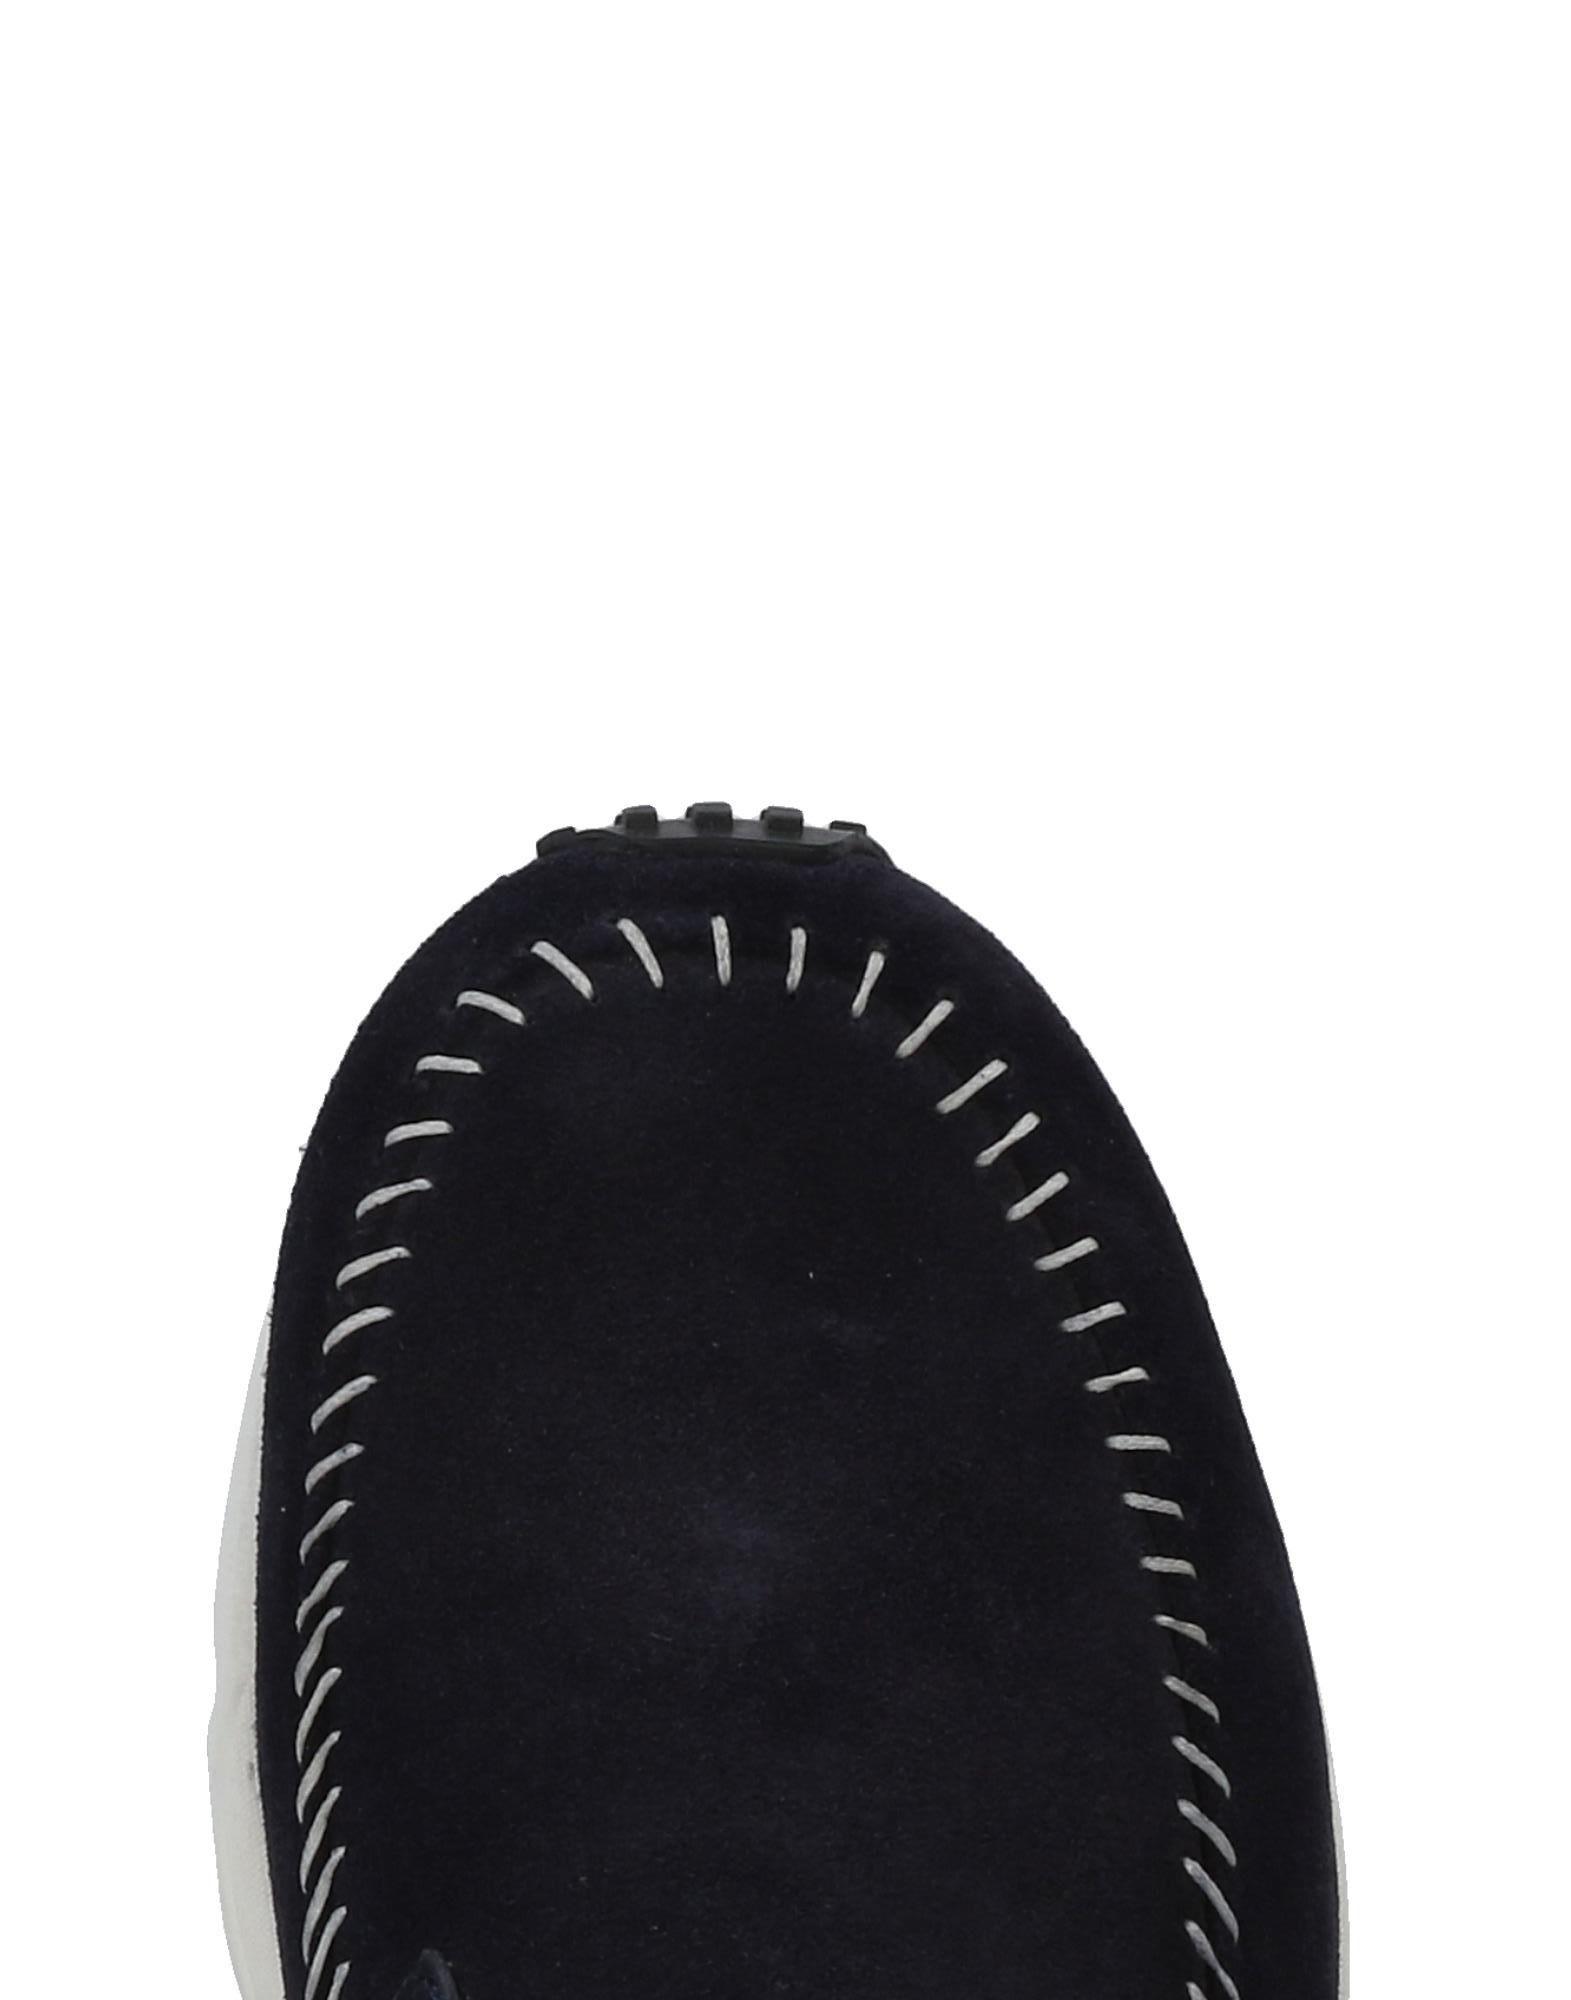 Buscemi Sneakers Herren  11426334WJ Gute Qualität beliebte Schuhe